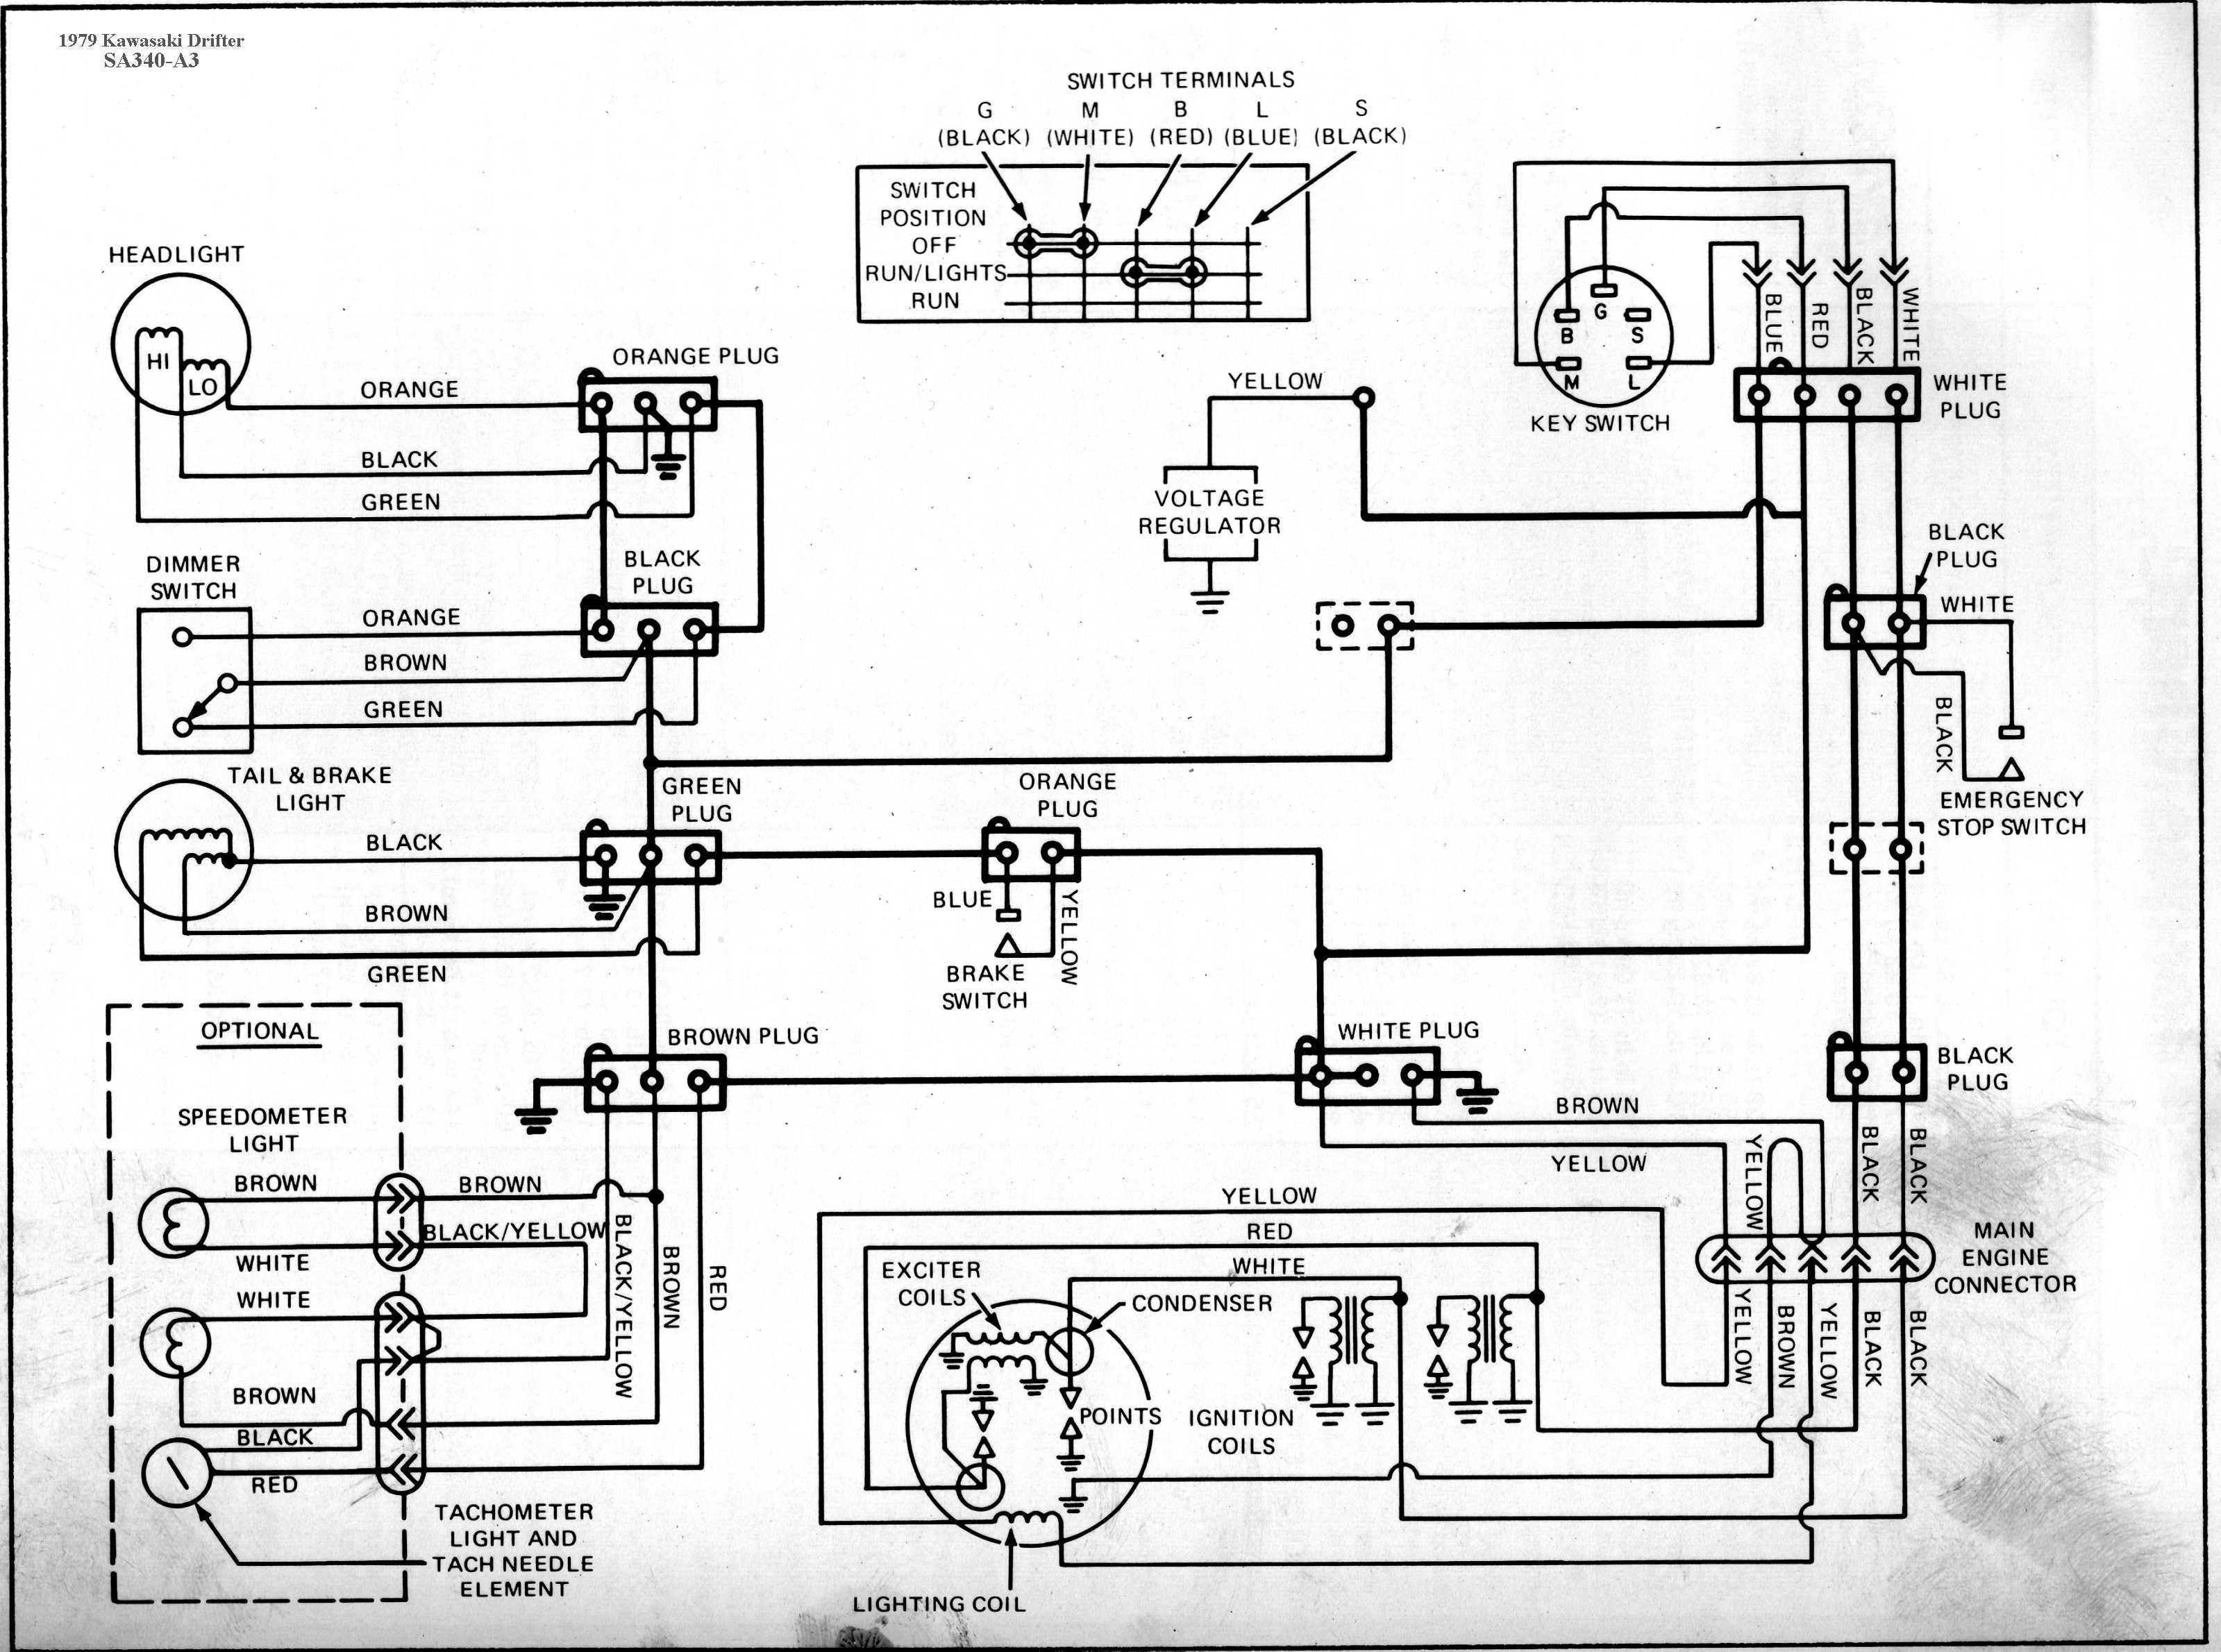 utilitech well pump 0003124 wiring diagram well utilitech pro condensate pump wiring diagram Utilitech Pump Lowe's